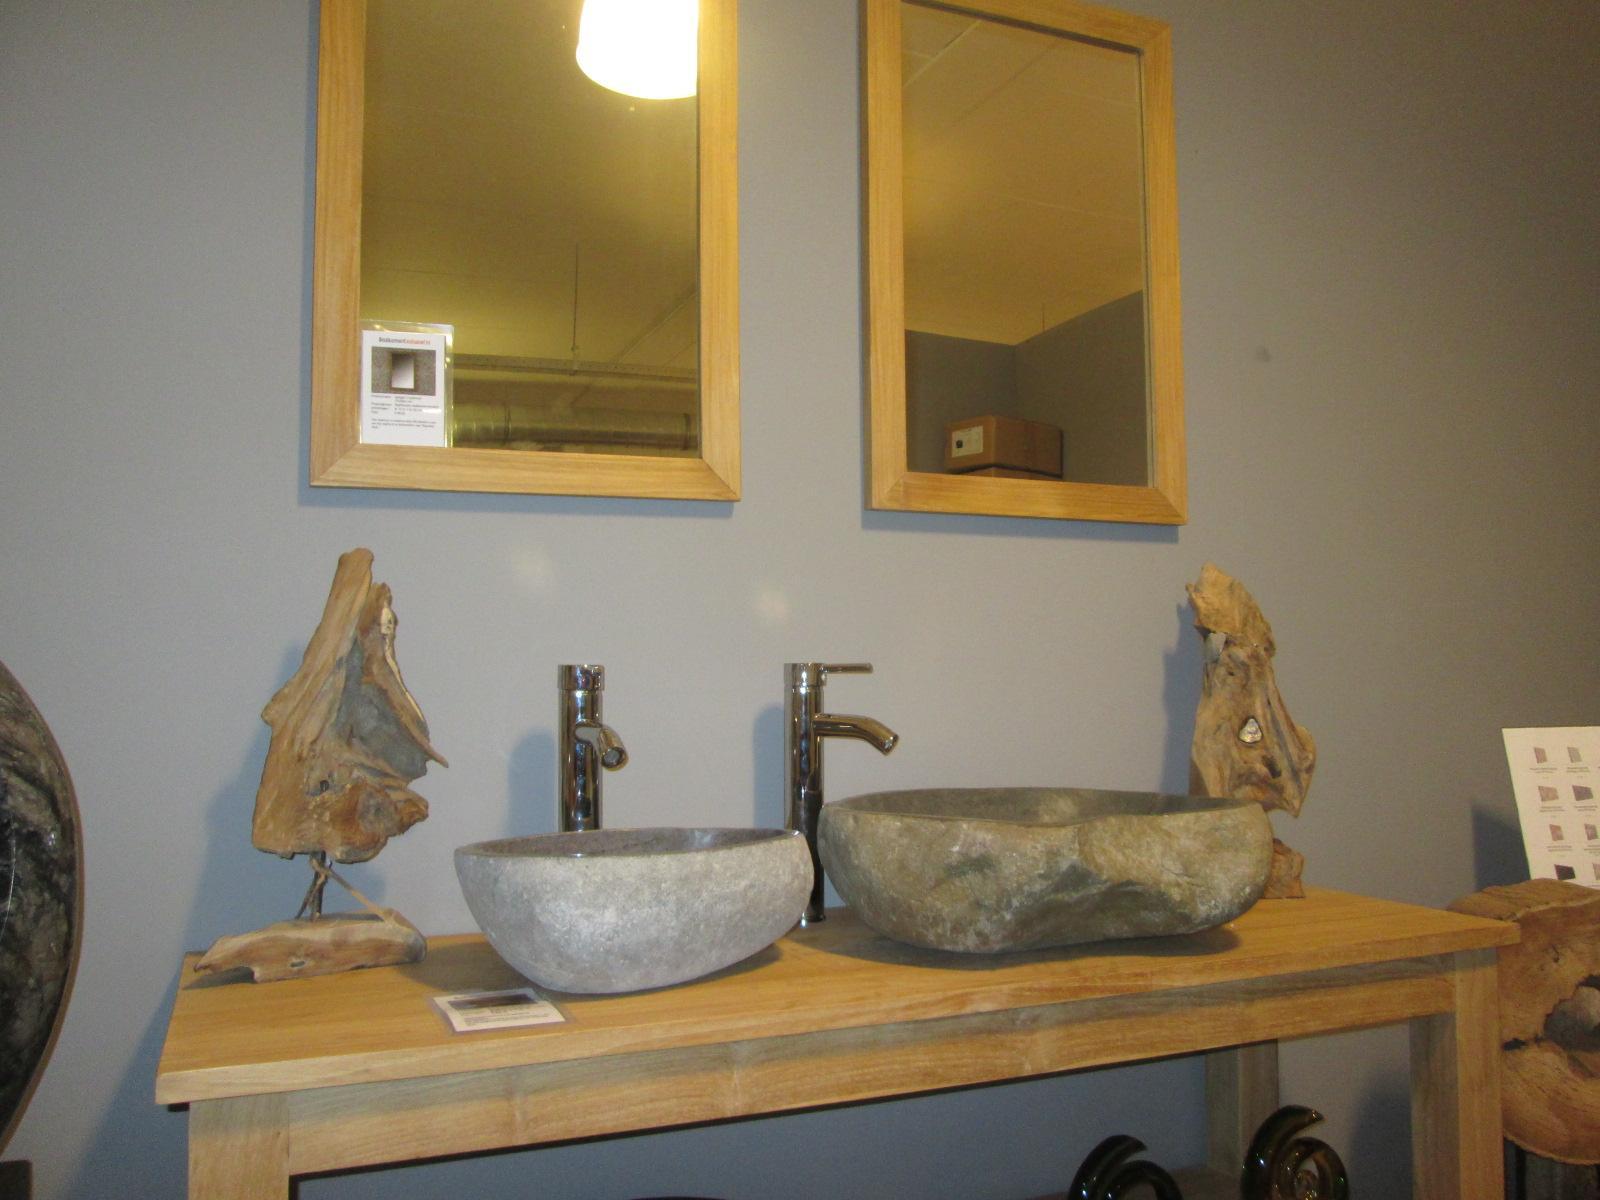 onderscheidende badkamermeubels uit teakhout en mindyhout